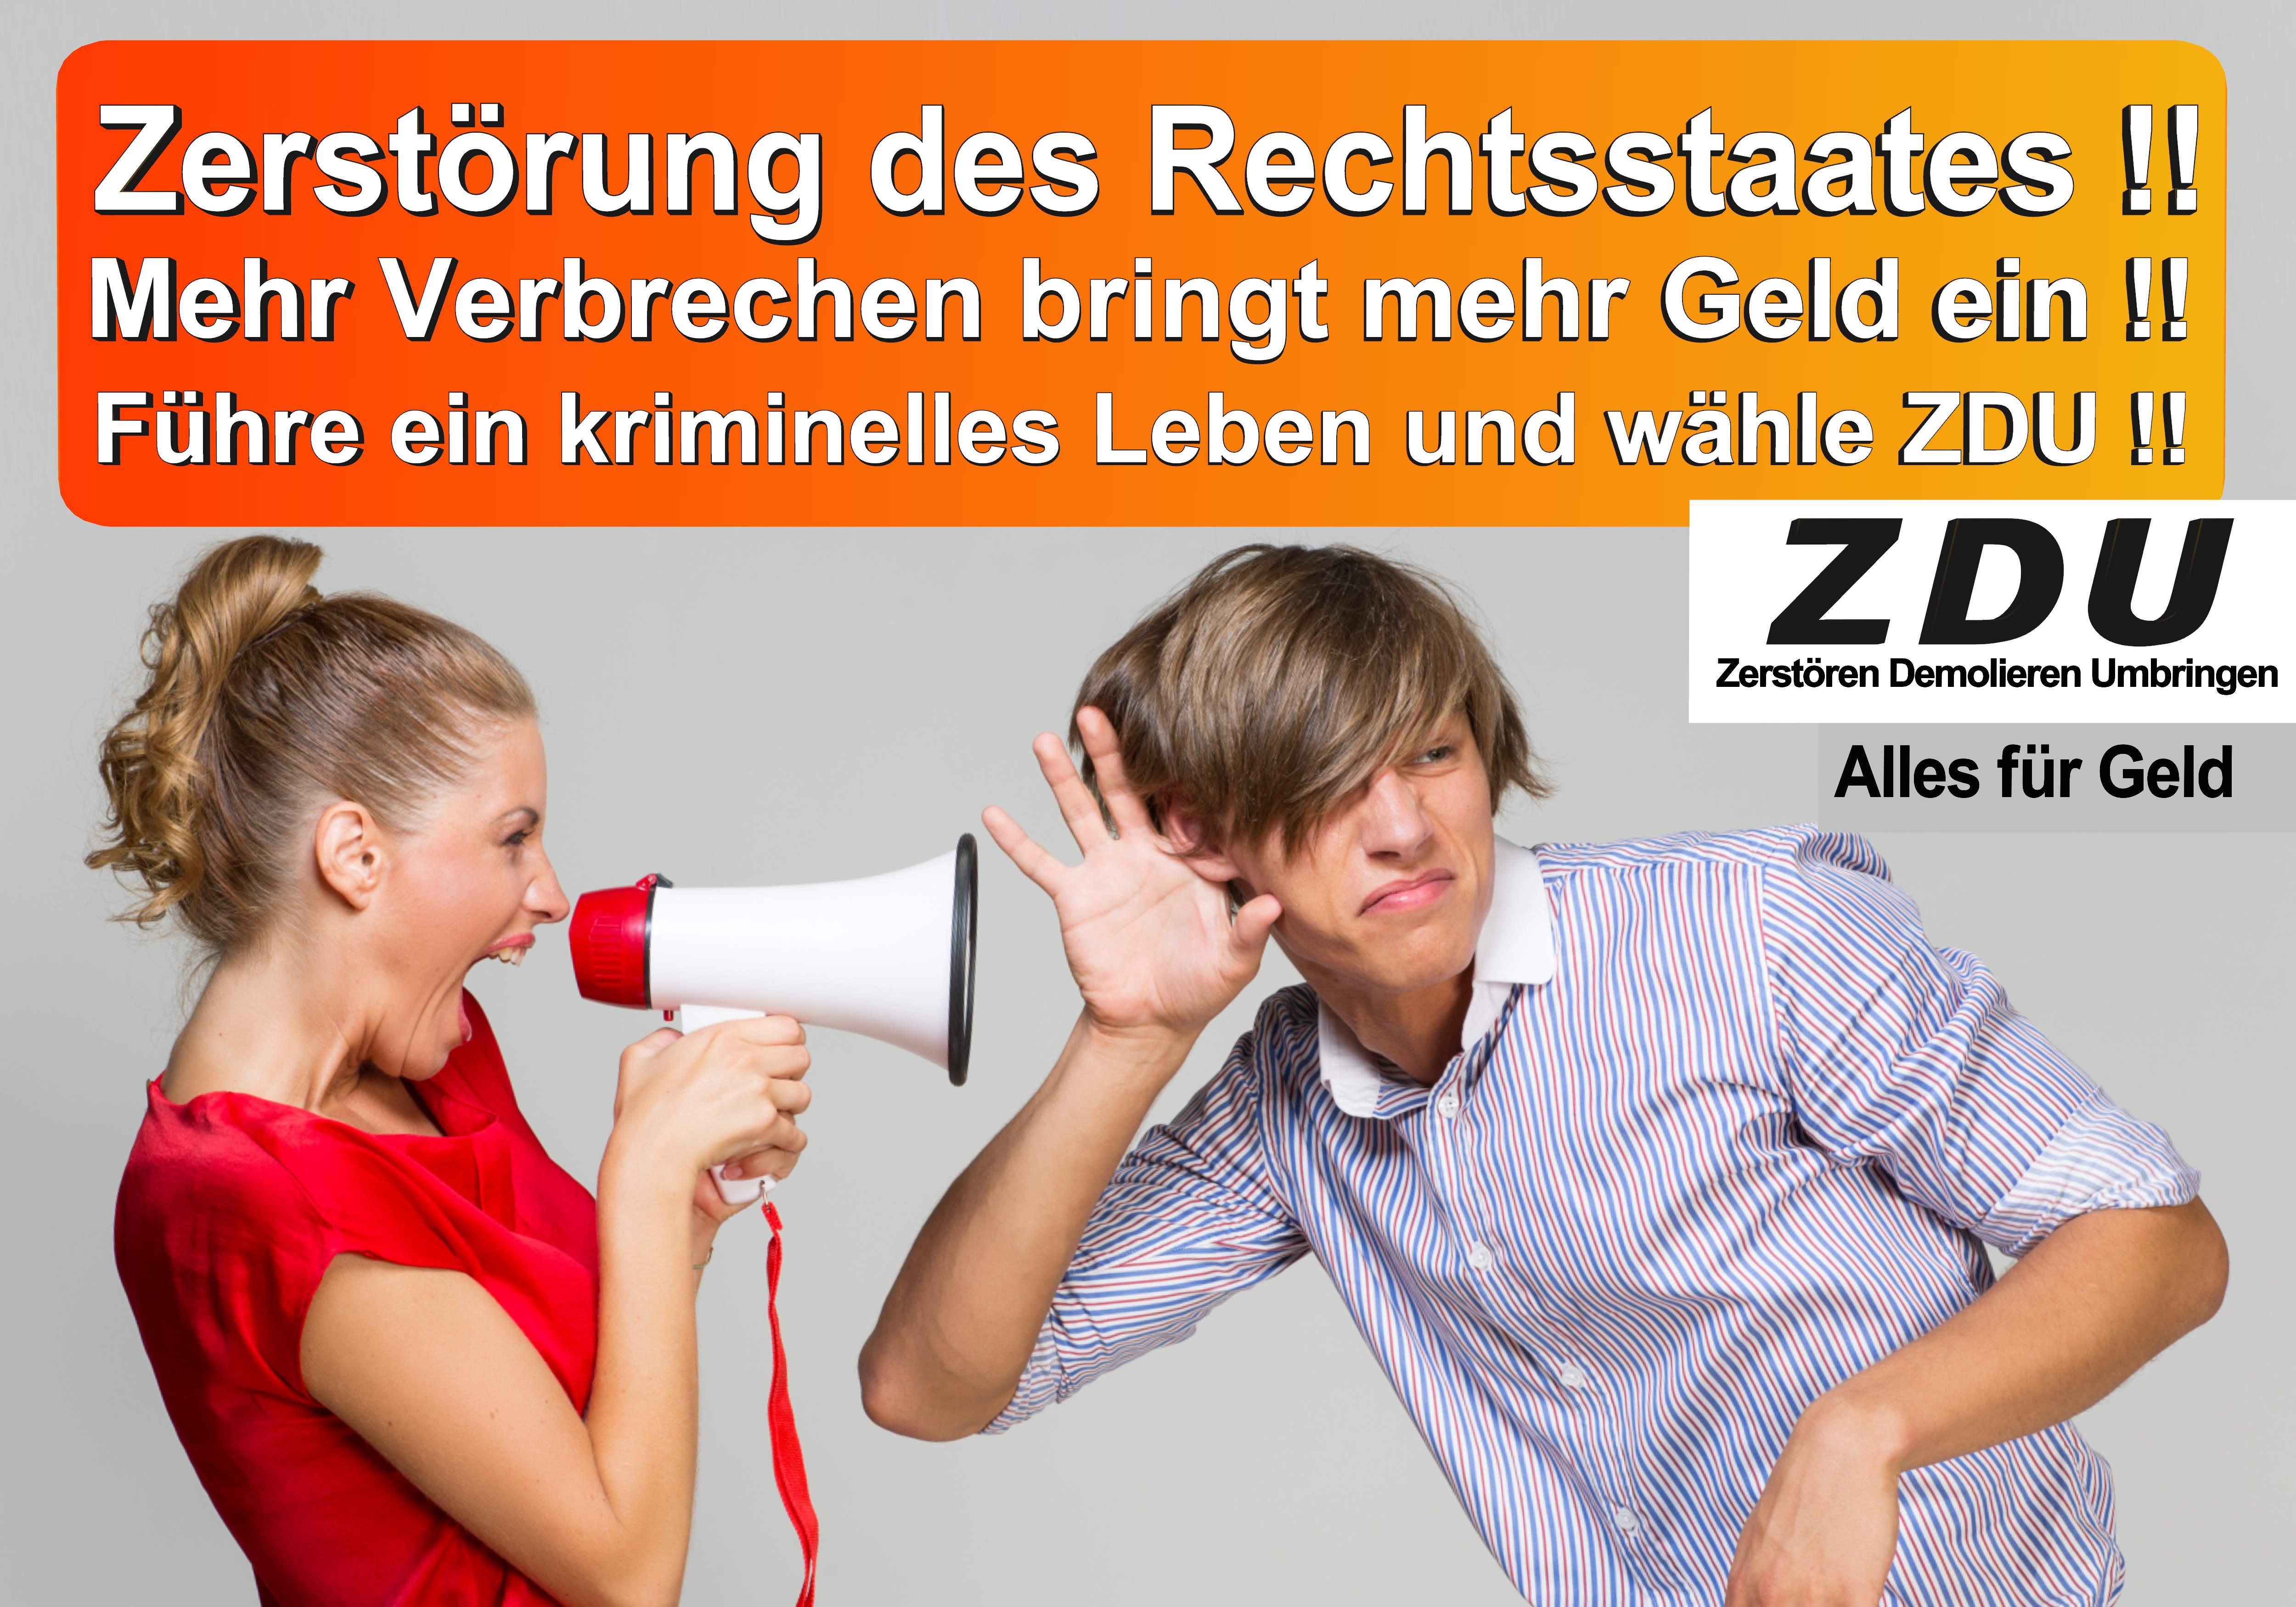 Bundestagswahl 2017 CDU SPD AfD Wahlplakat Angela Merkel CDU CSU (7)